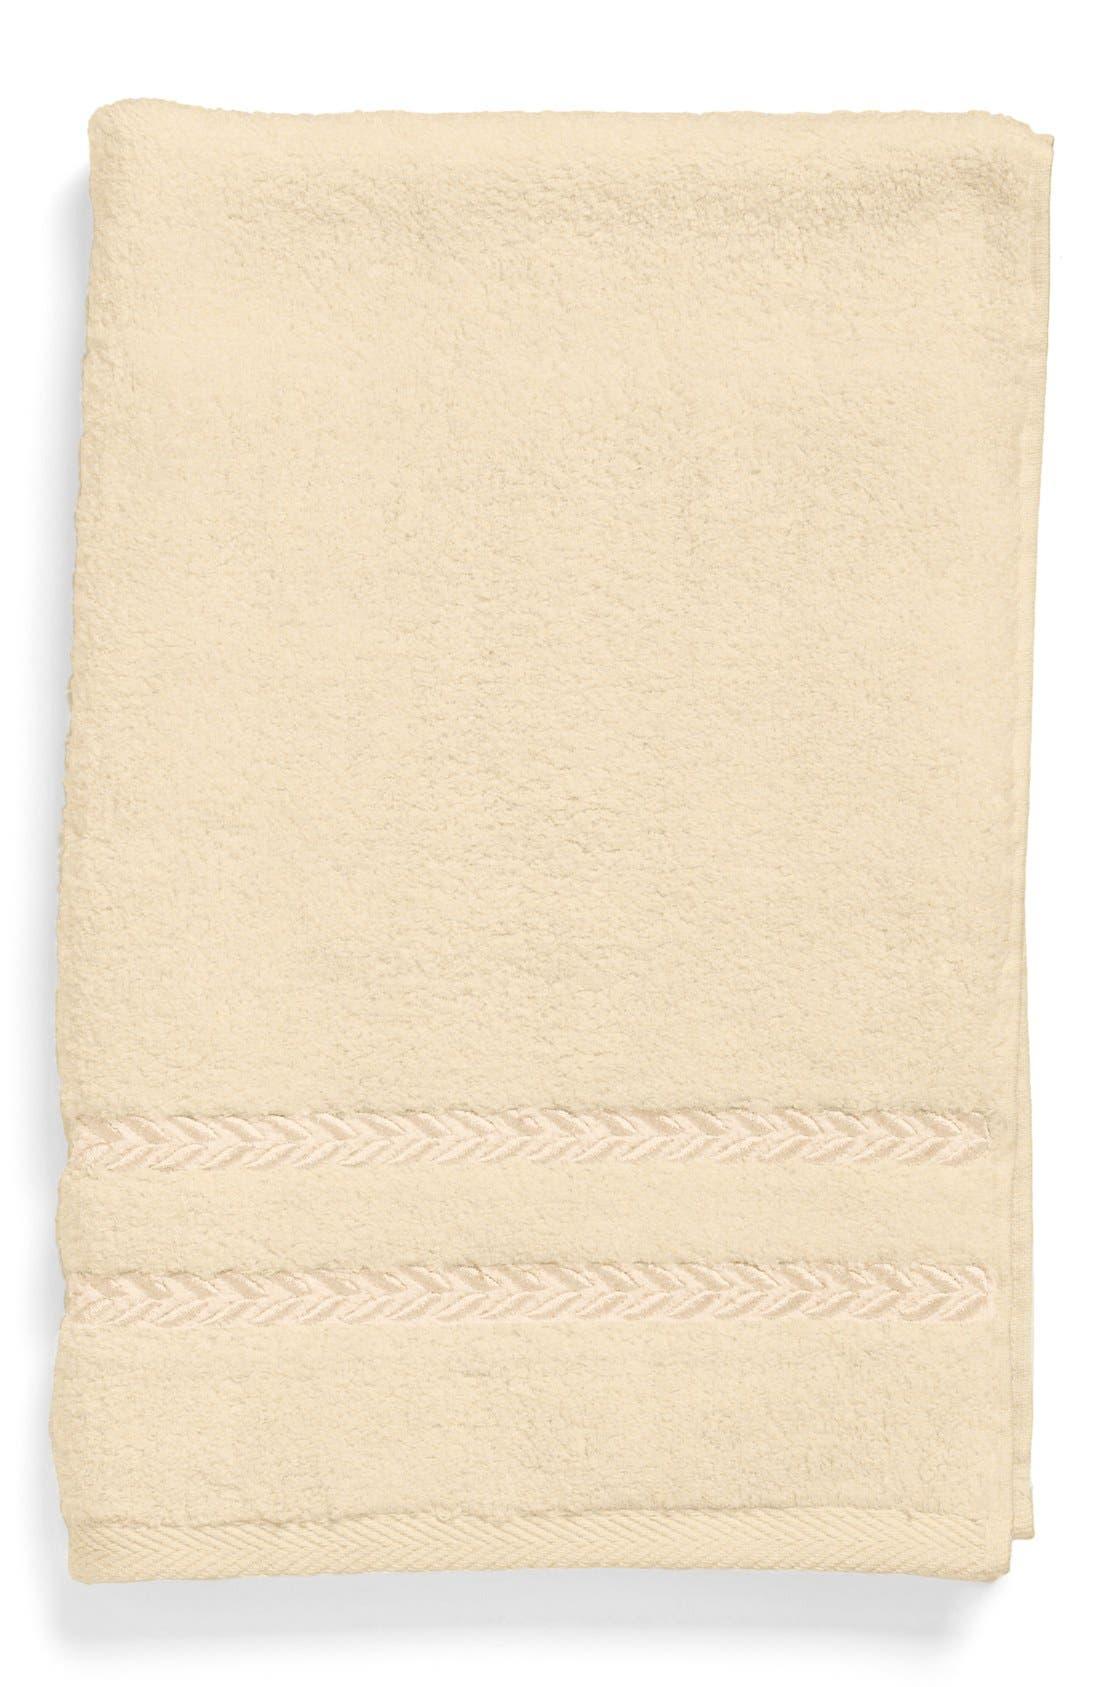 'Pearl Essence' Hand Towel,                         Main,                         color, 250